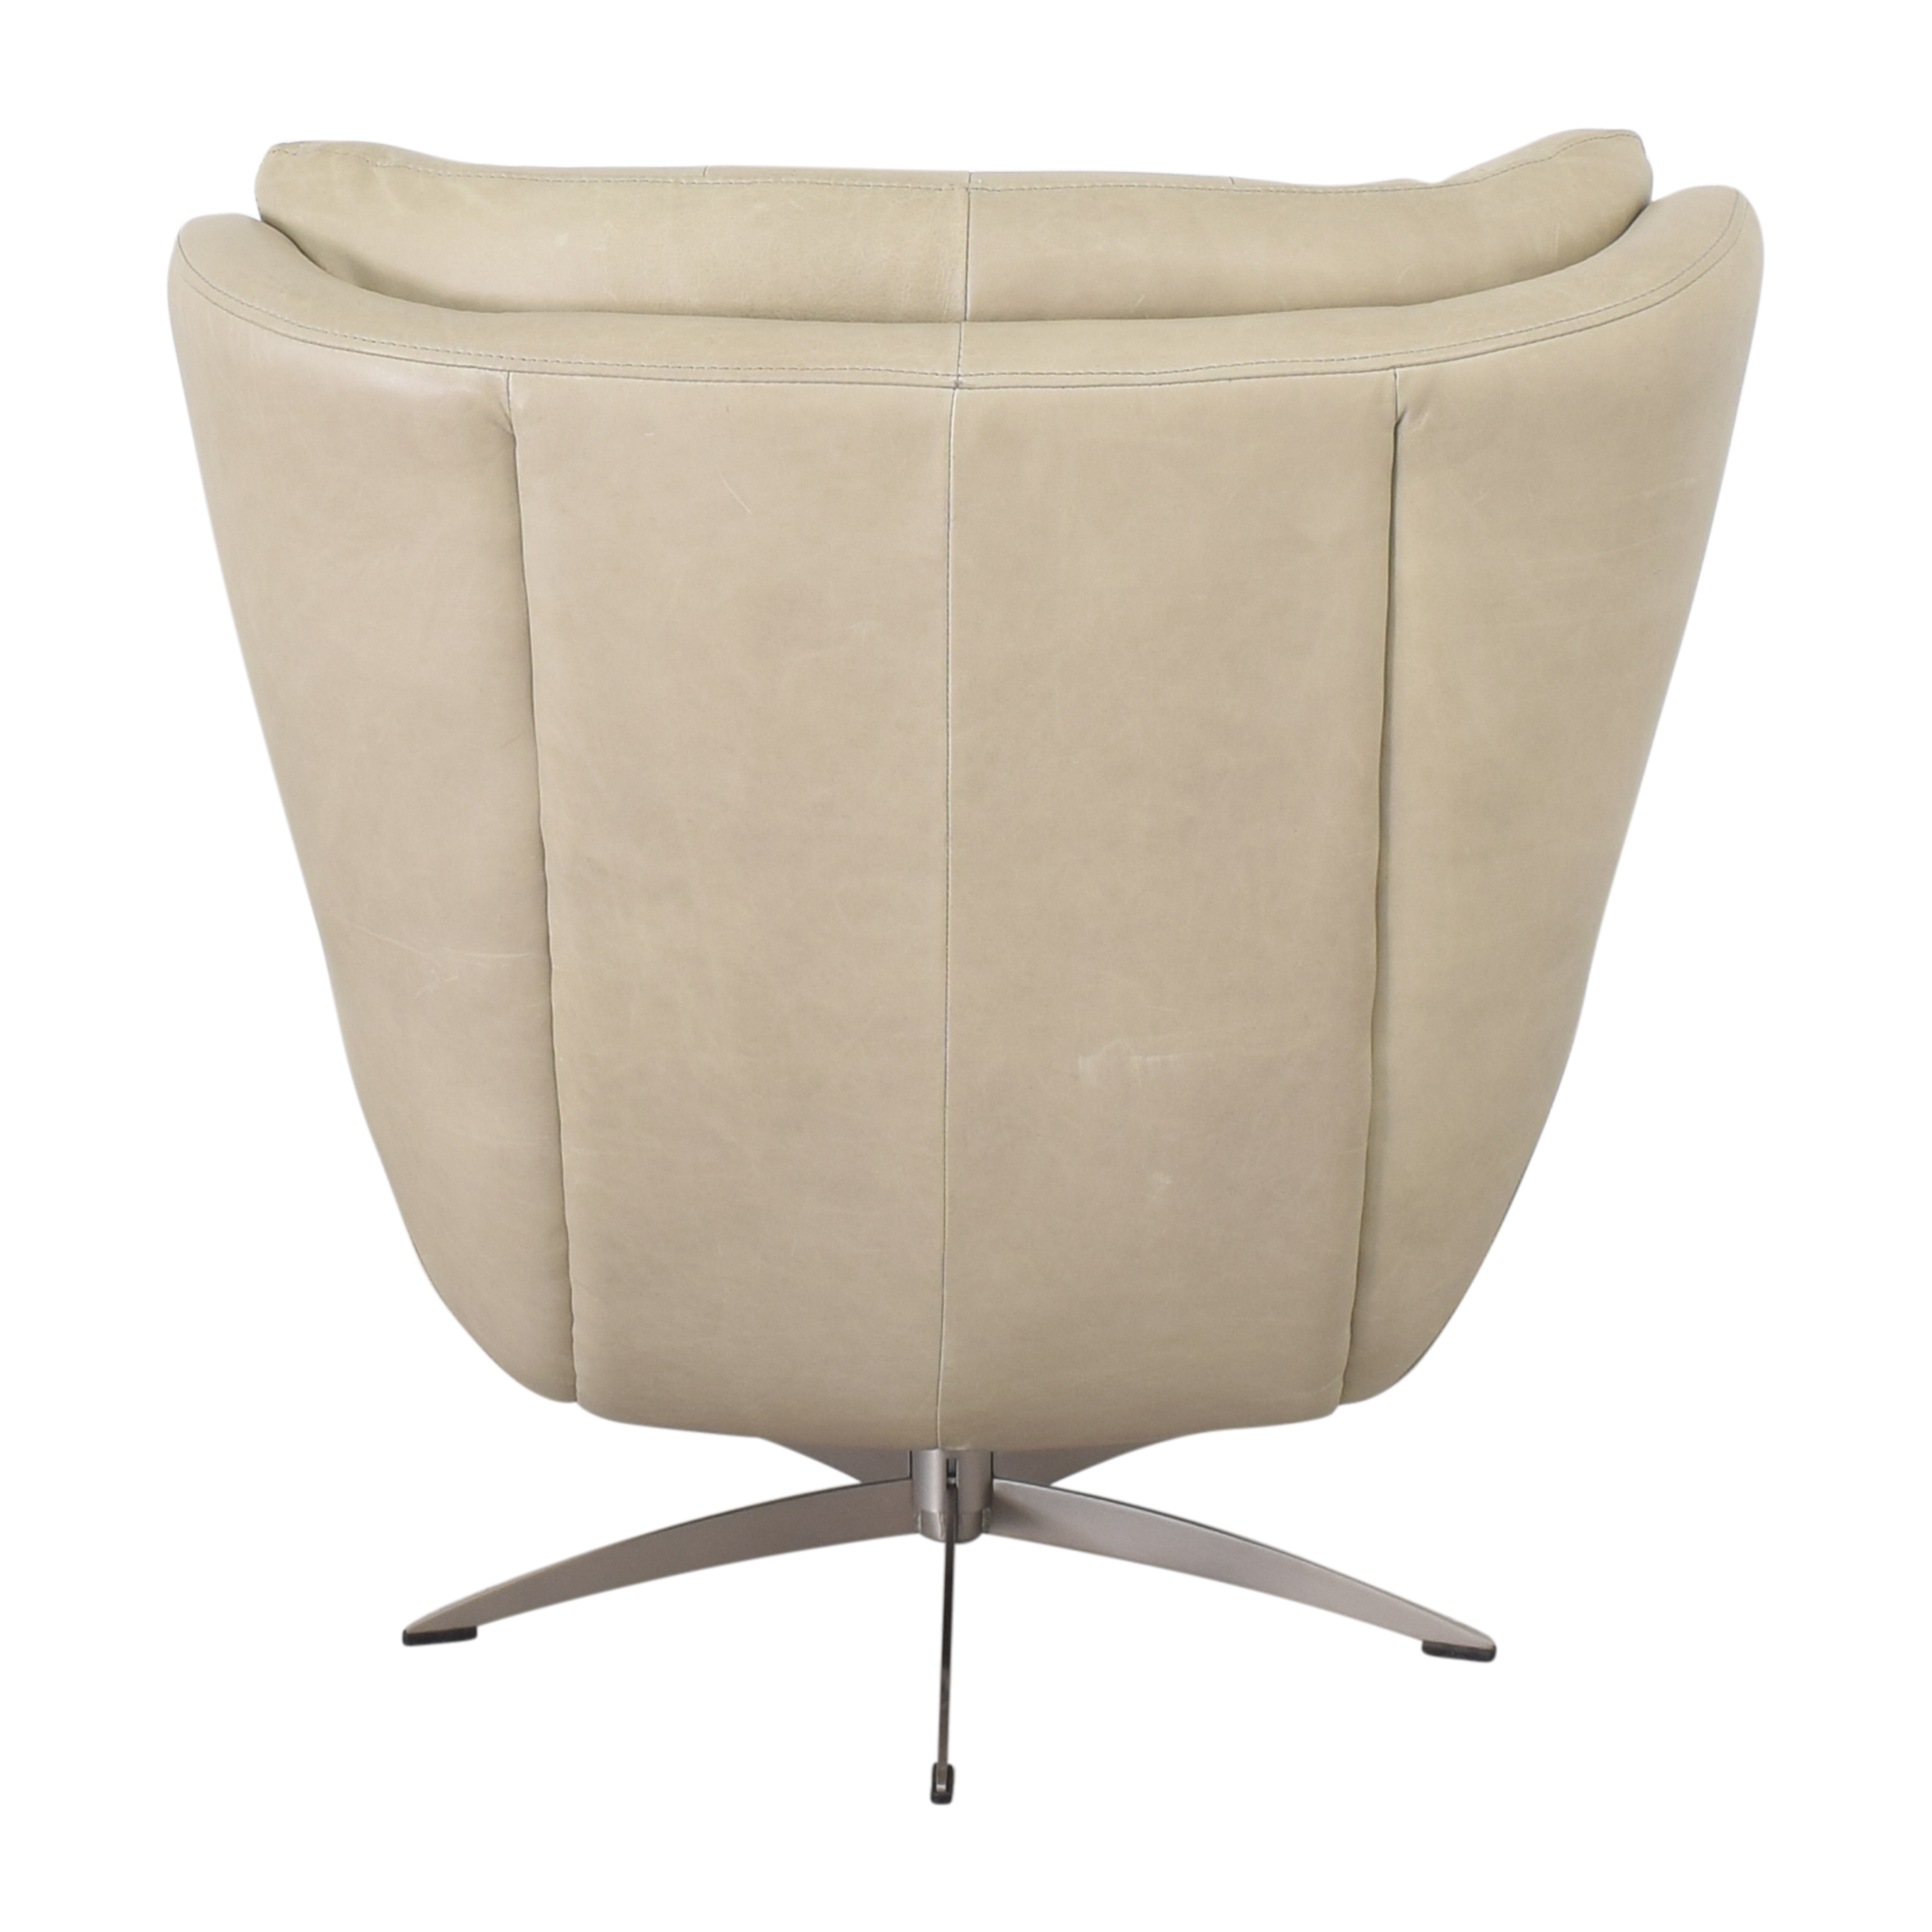 buy Pottery Barn Wells Leather Swivel Armchair Pottery Barn Chairs